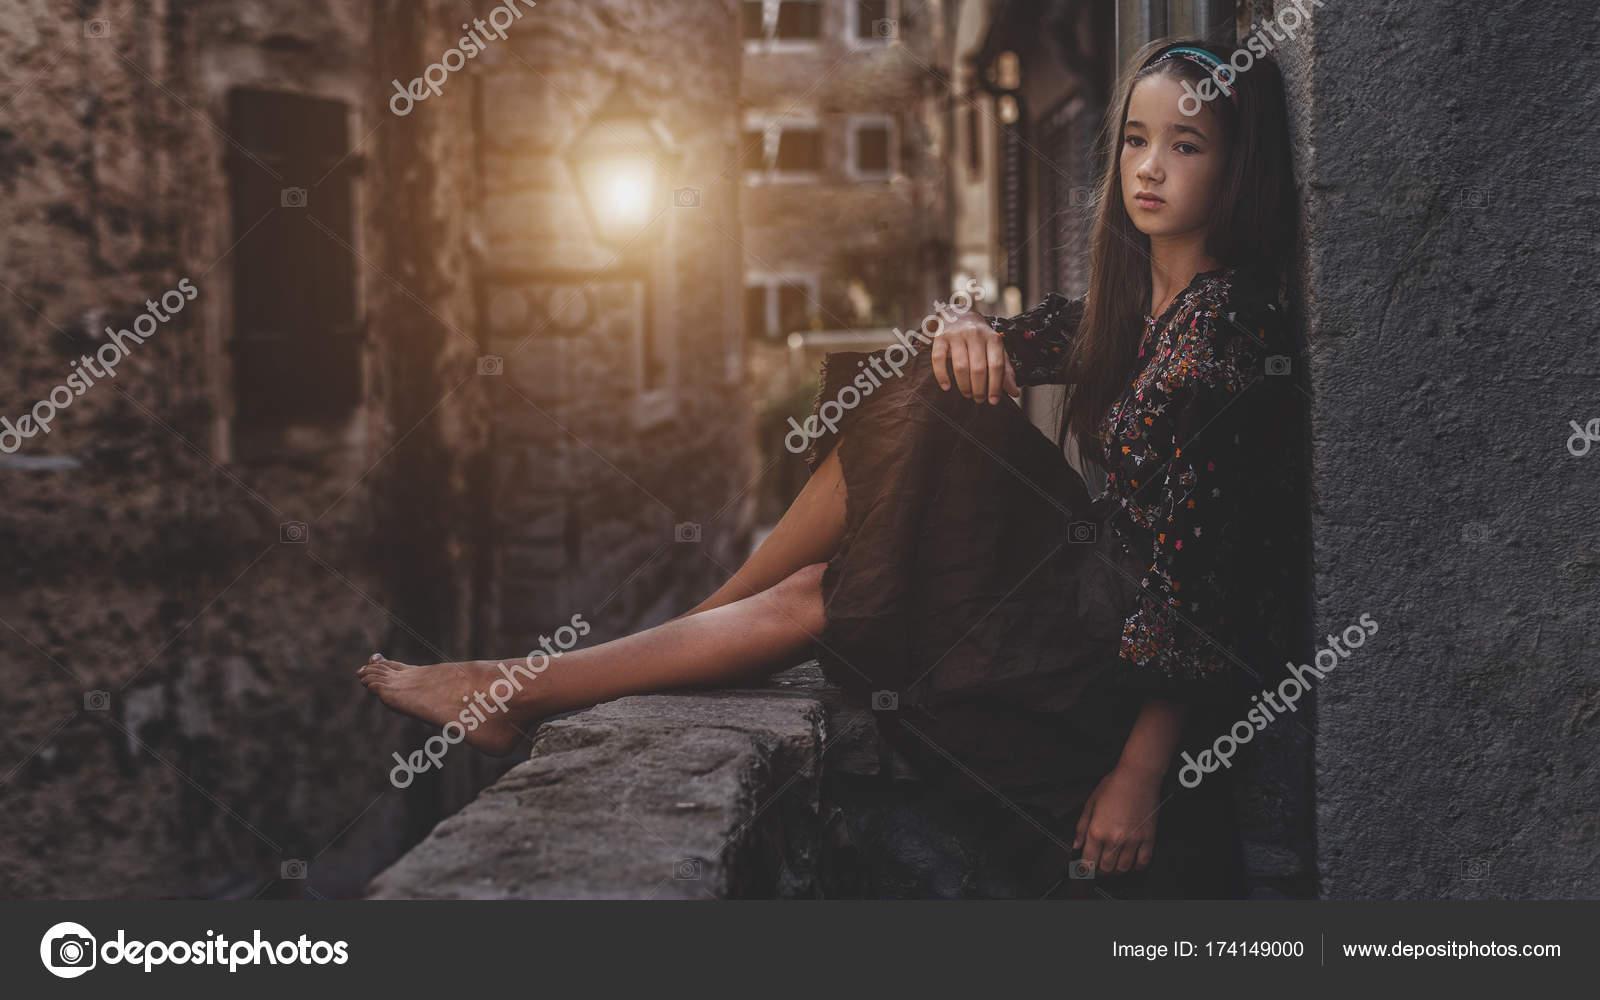 0b9fb650508 Χαριτωμένο νεαρή κοπέλα κάθεται στην οροφή της παλιάς πόλης. Ωραίο θηλυκό  παιδί στην μεσαιωνική πόλη